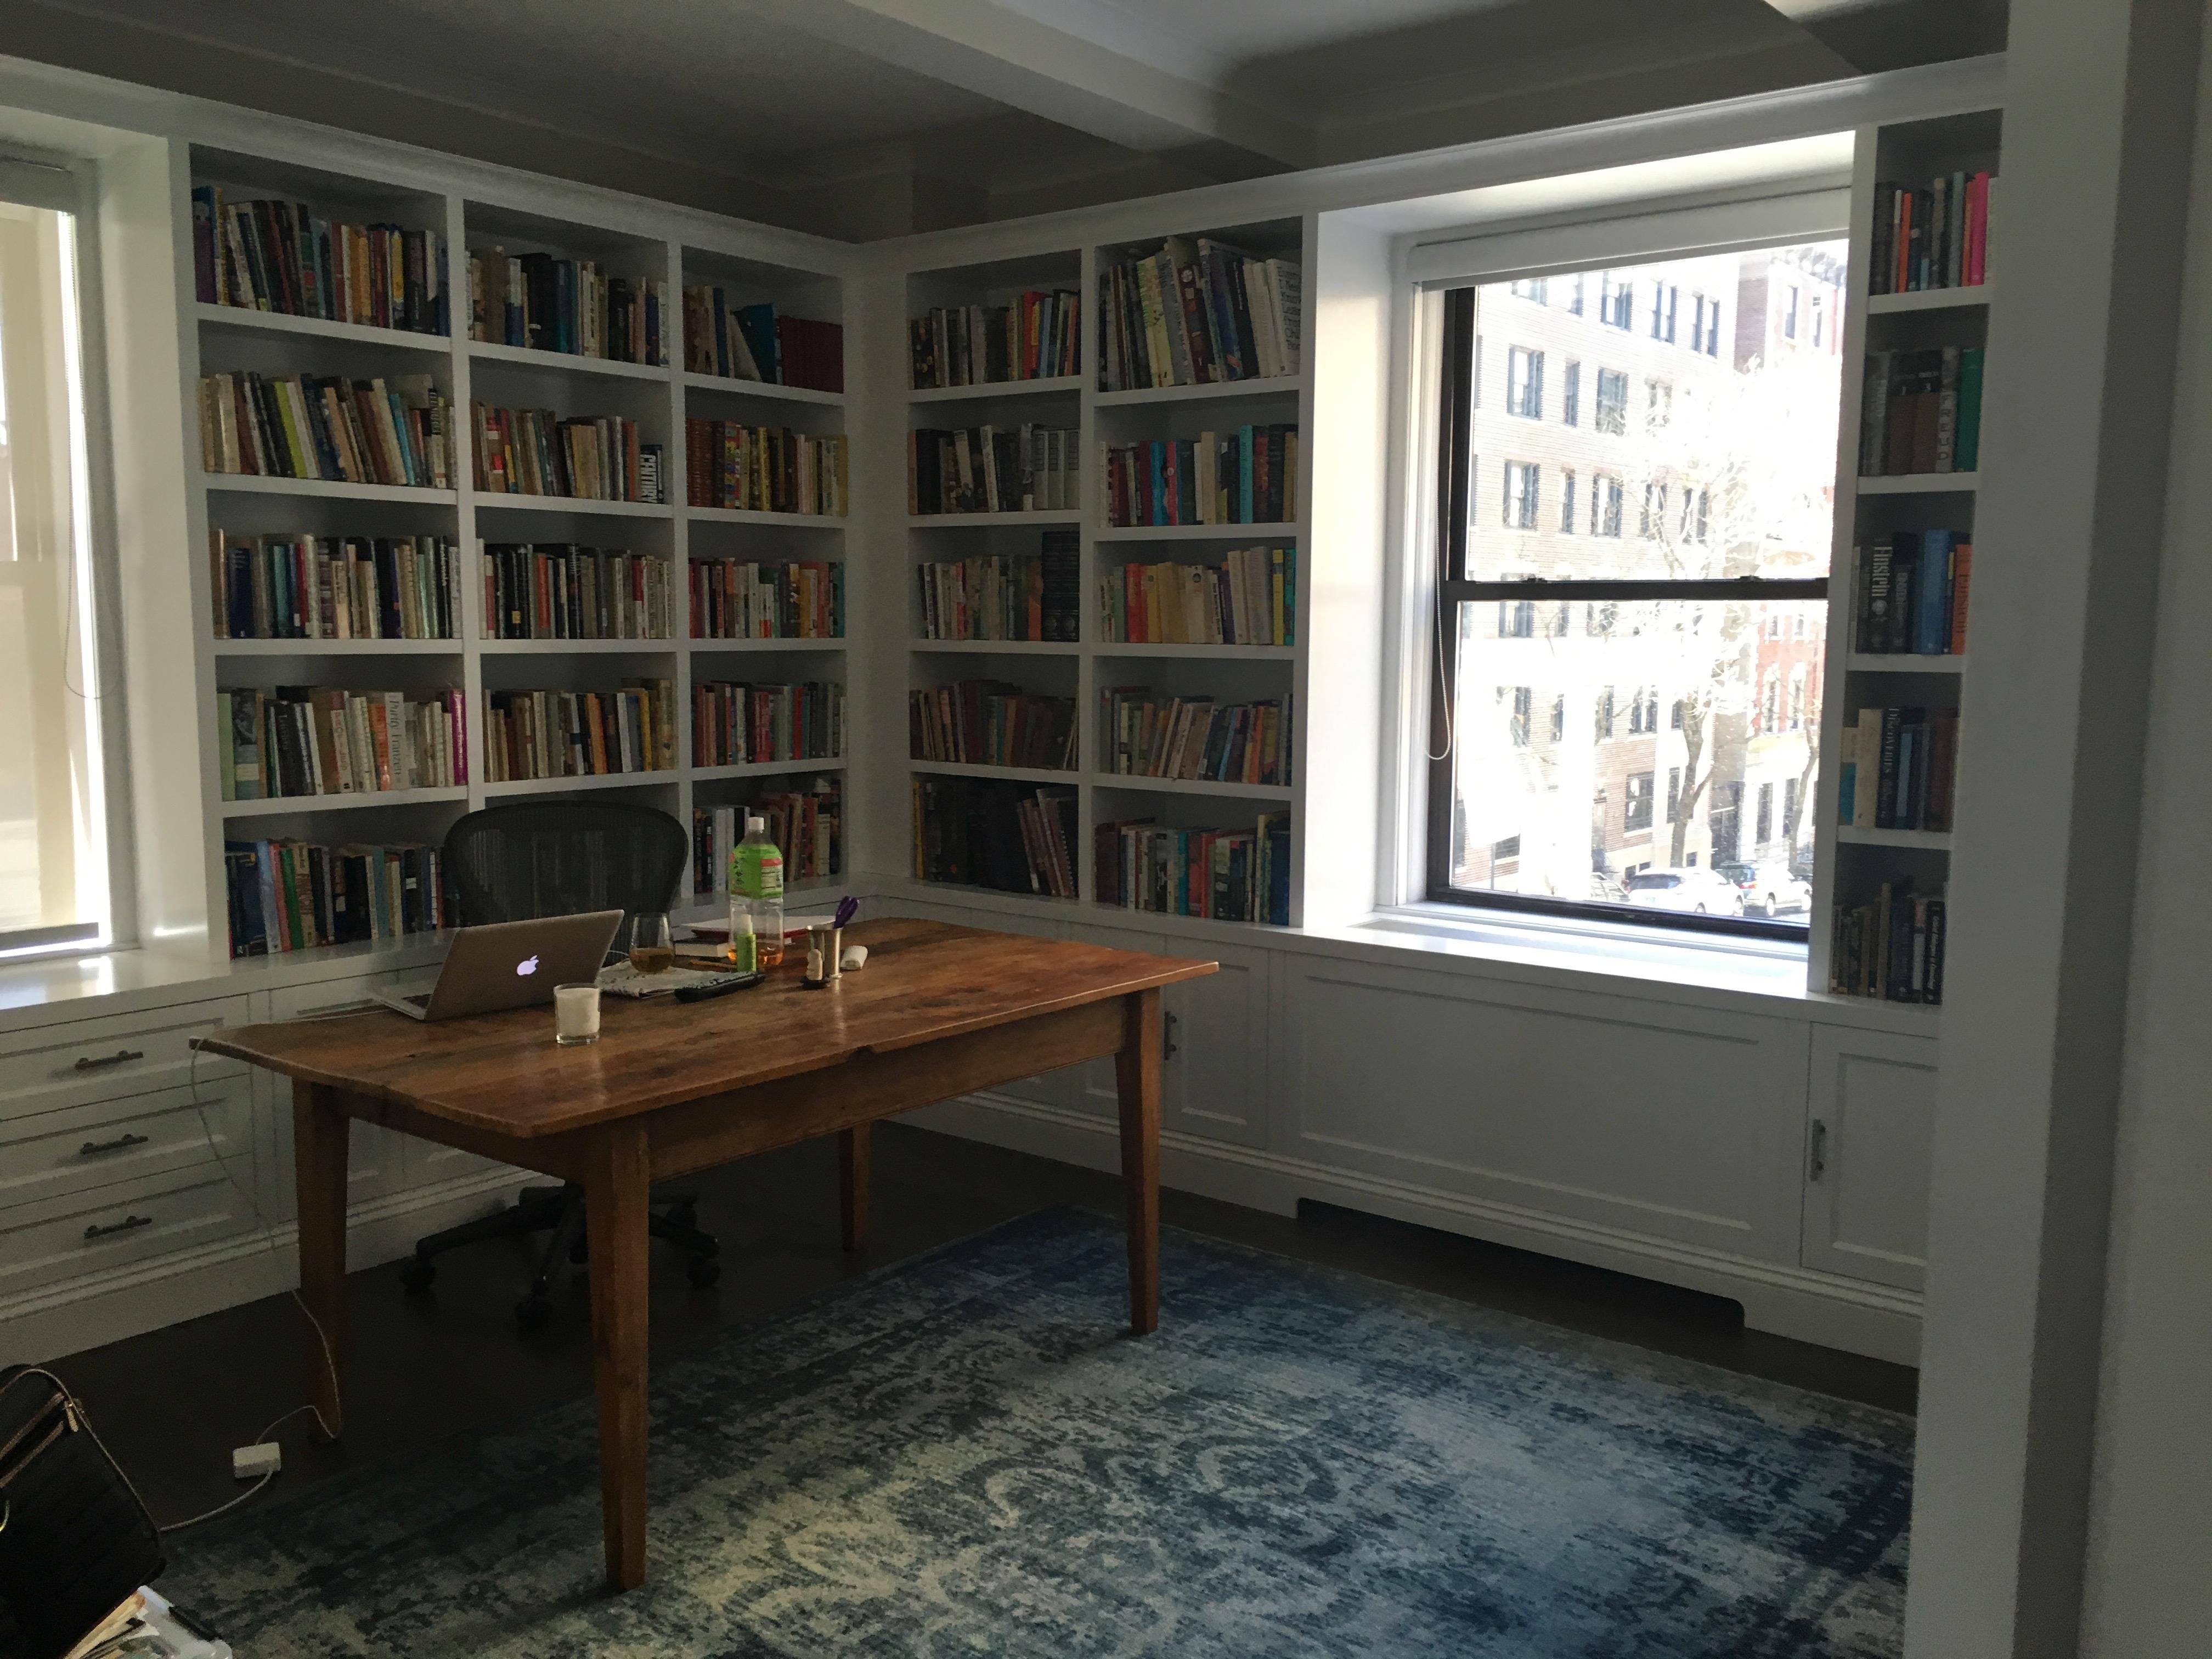 Meg Wolitzer's office.